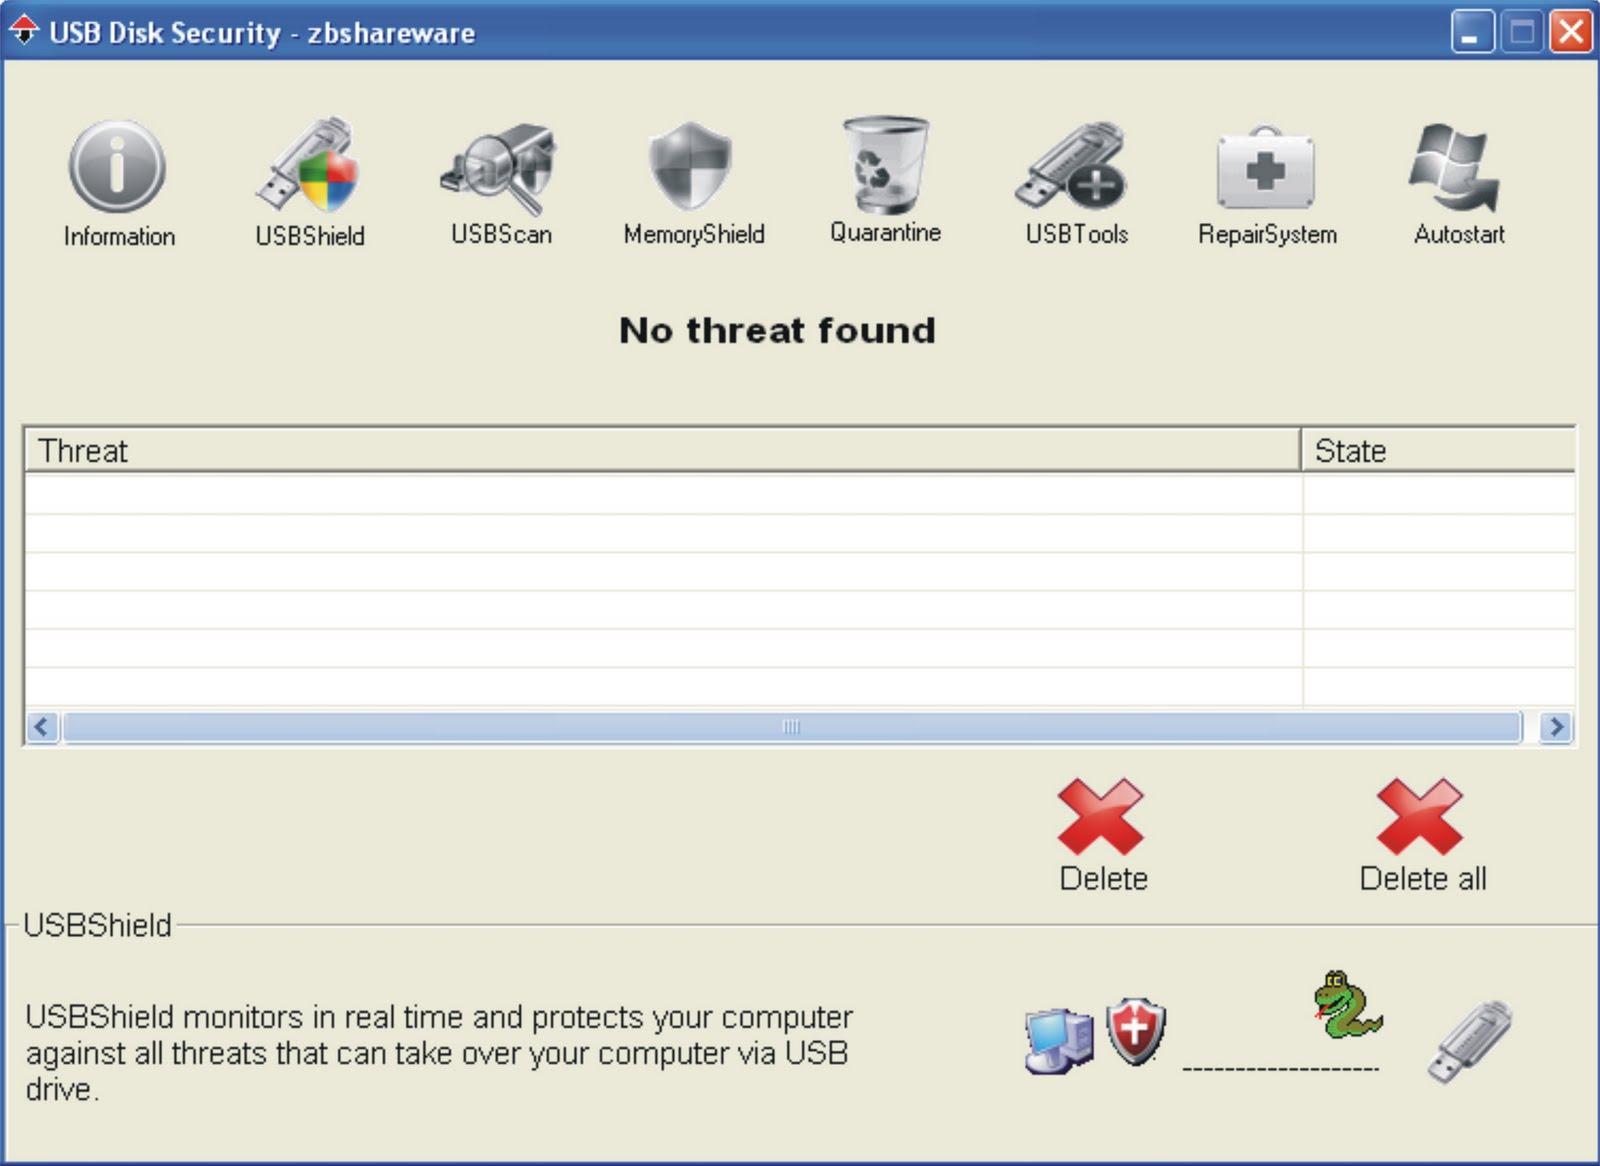 Kaspersky Anti-Virus 7.0.1.321 Final + Рабочие ключи!!! k Скачать.